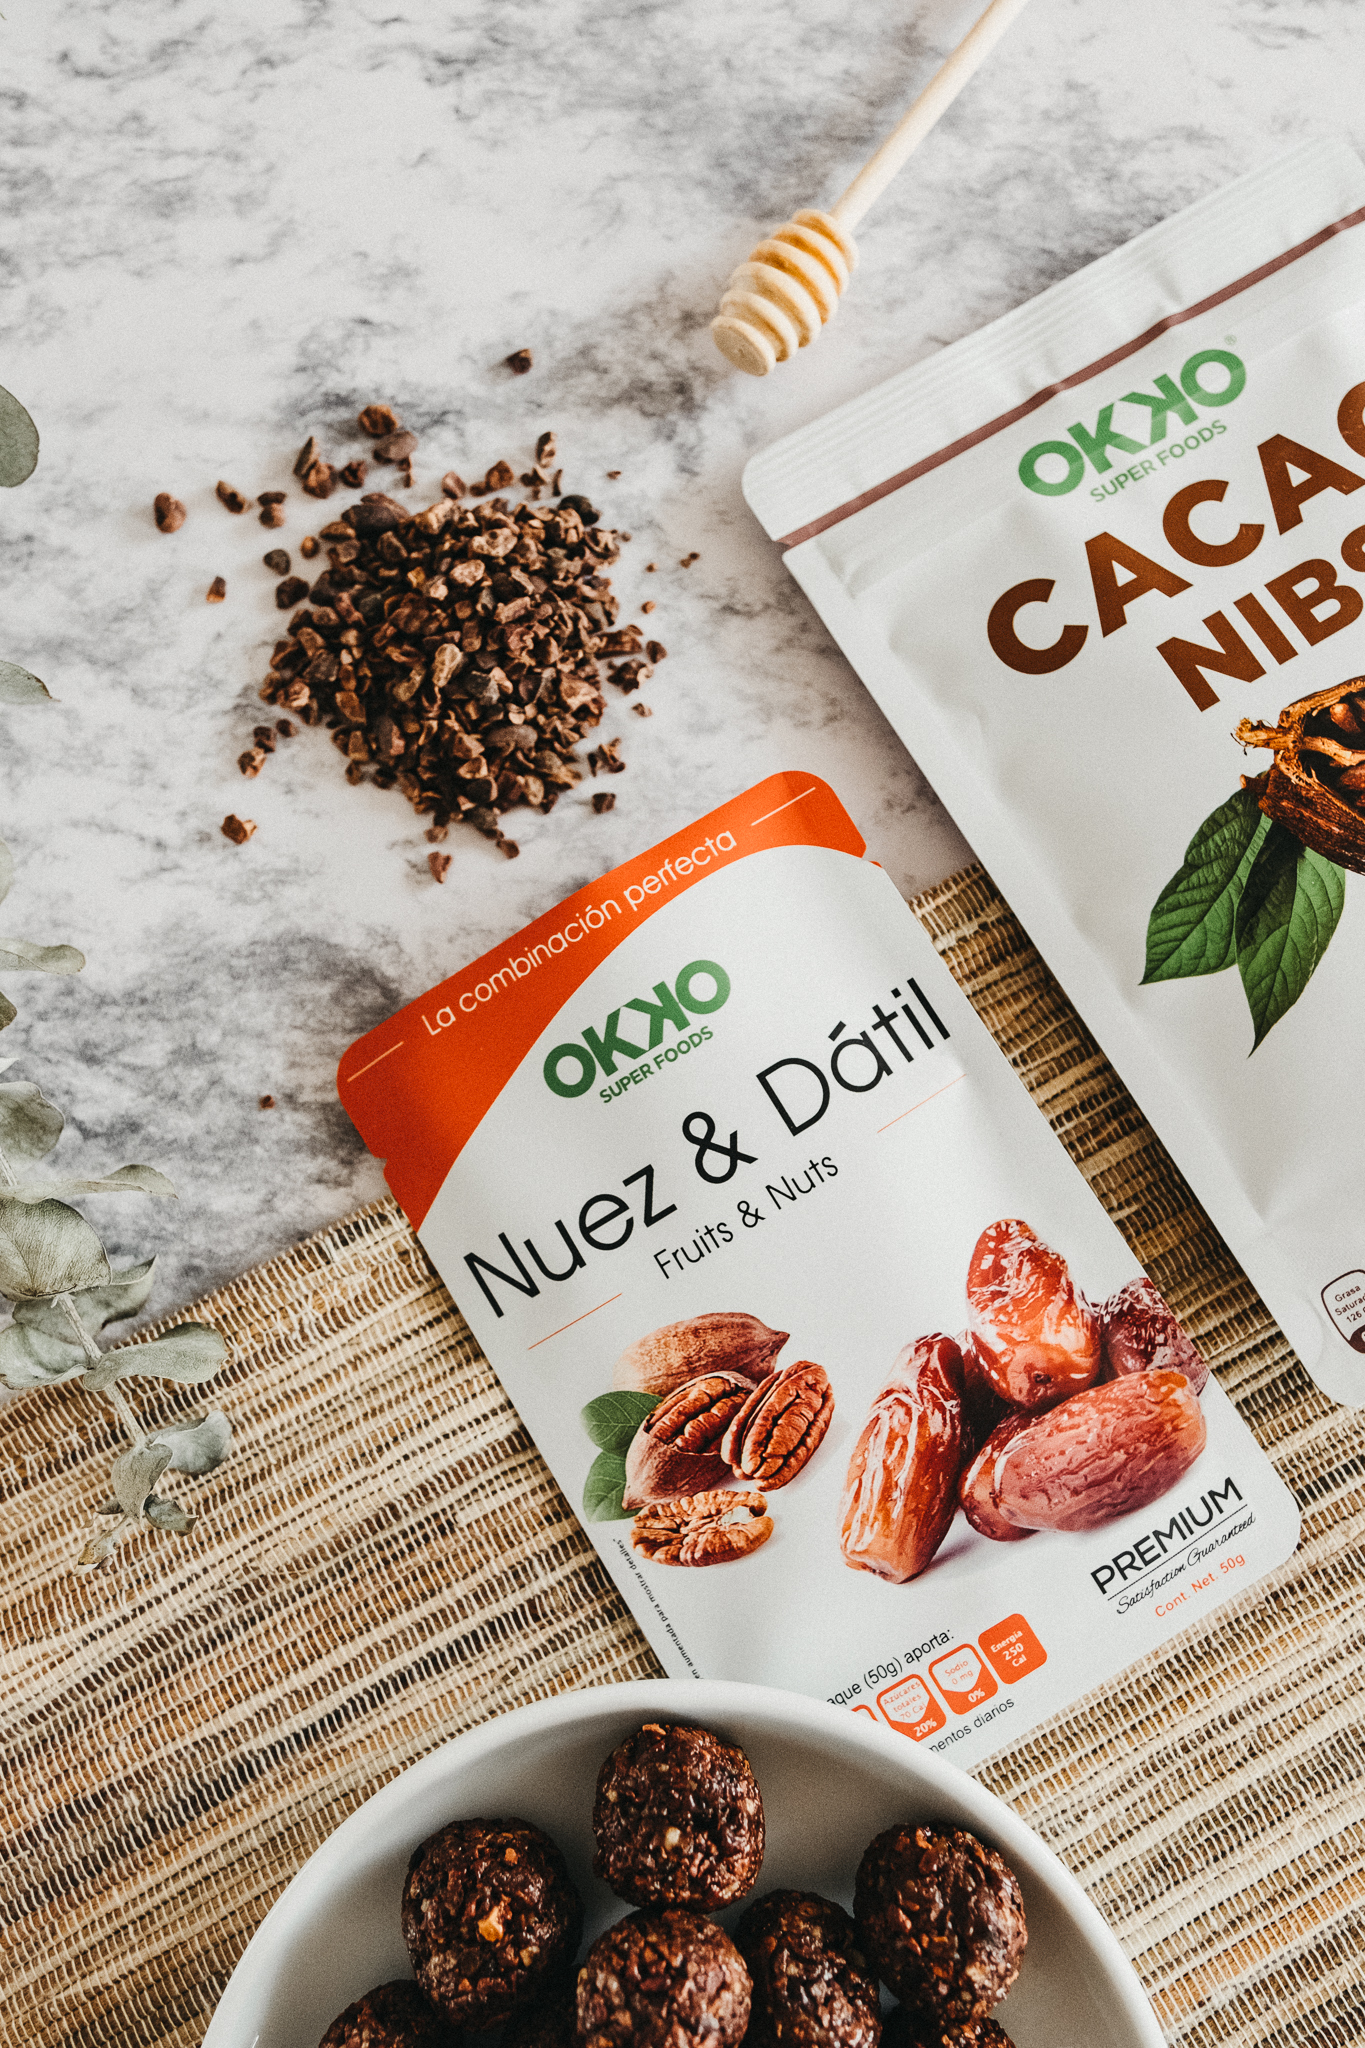 okko-superfoods-product-photography-5